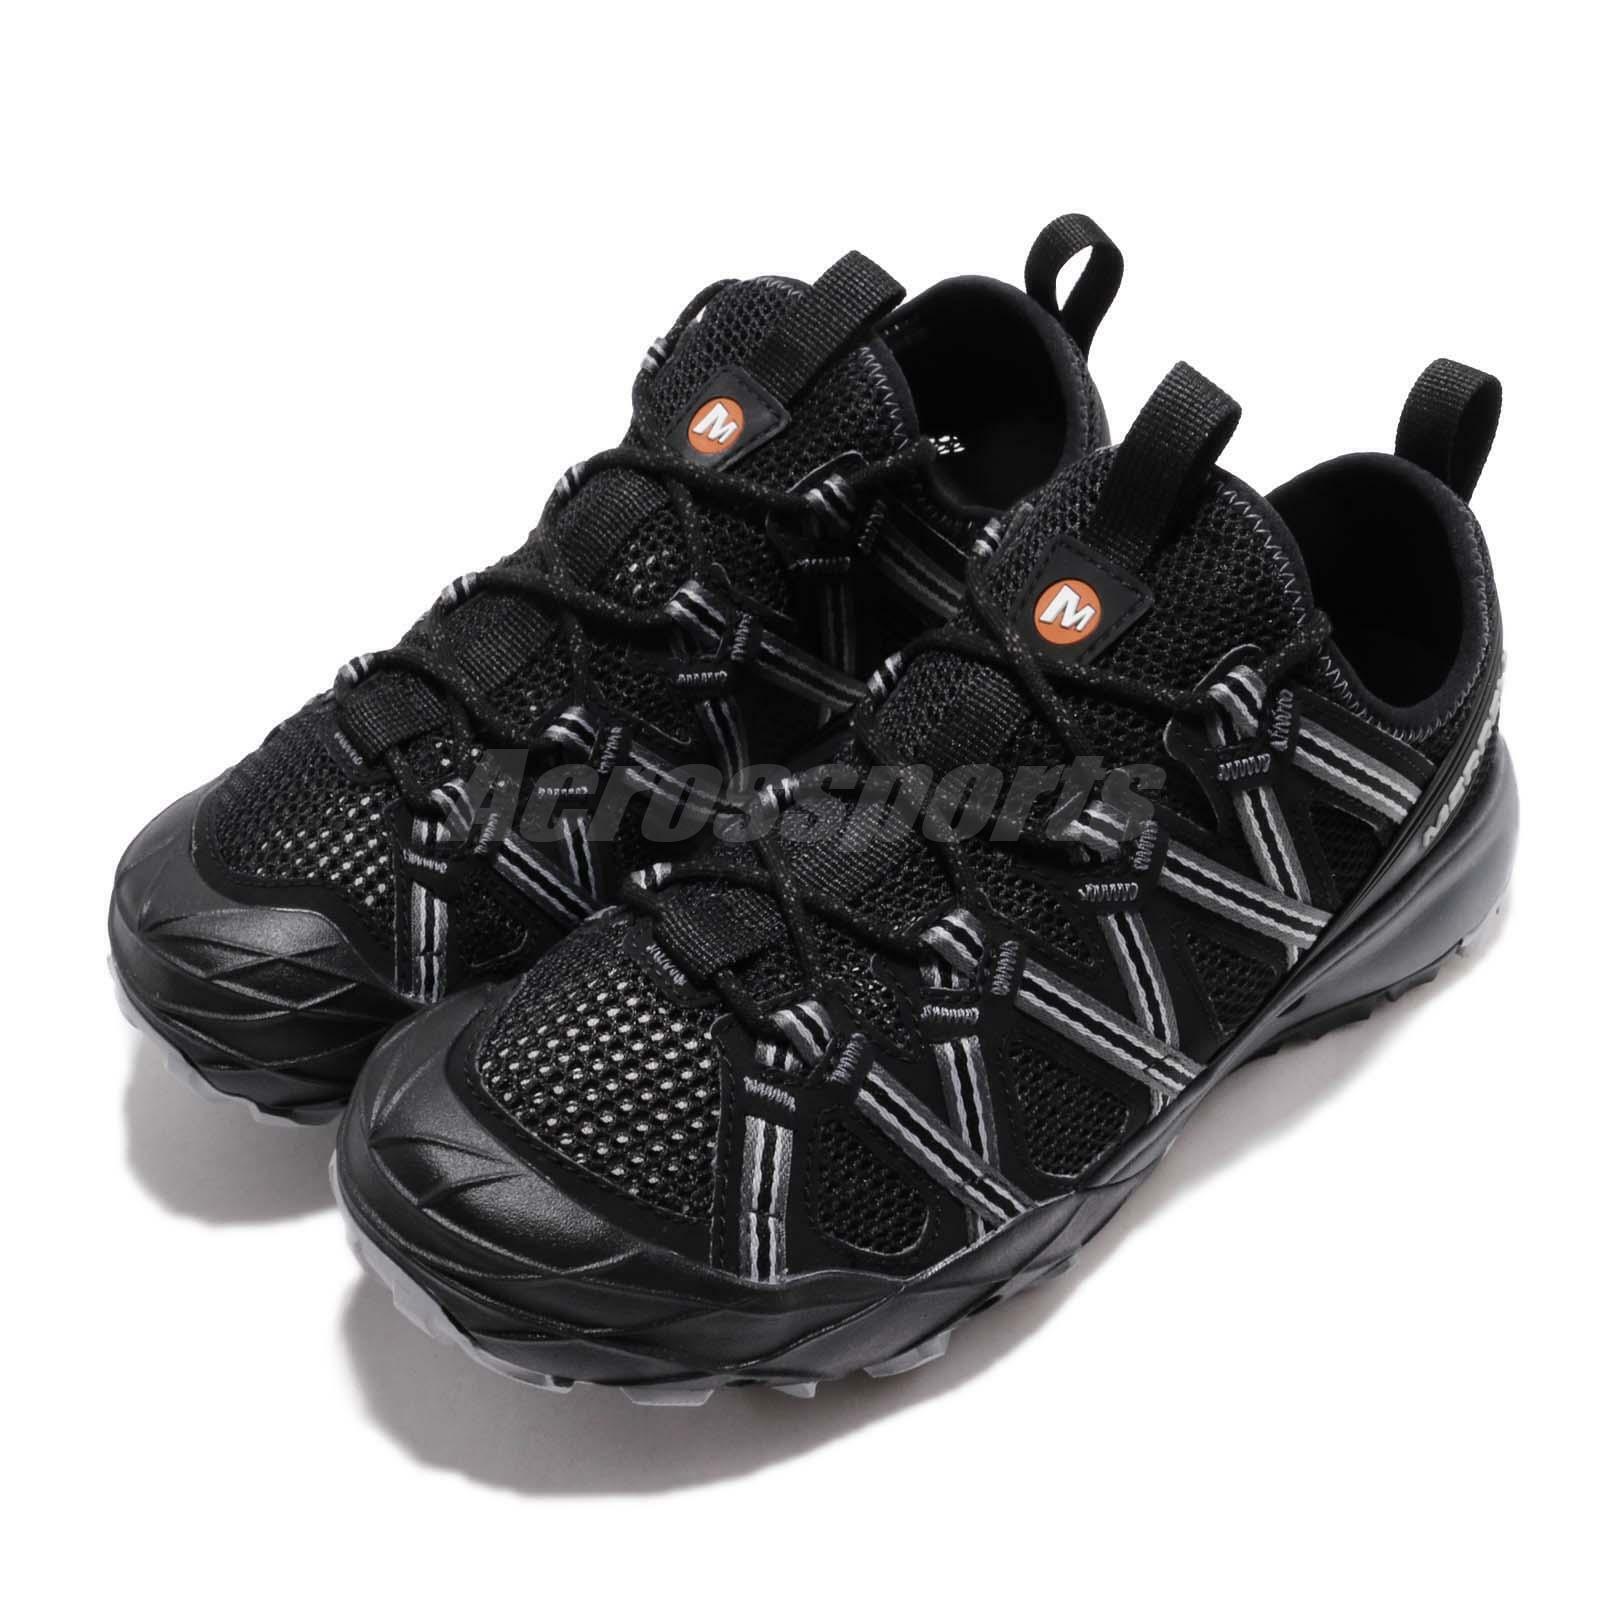 Merrell Choprock Vibram negro gris Men Outdoors Hiking Trail Water zapatos J48675